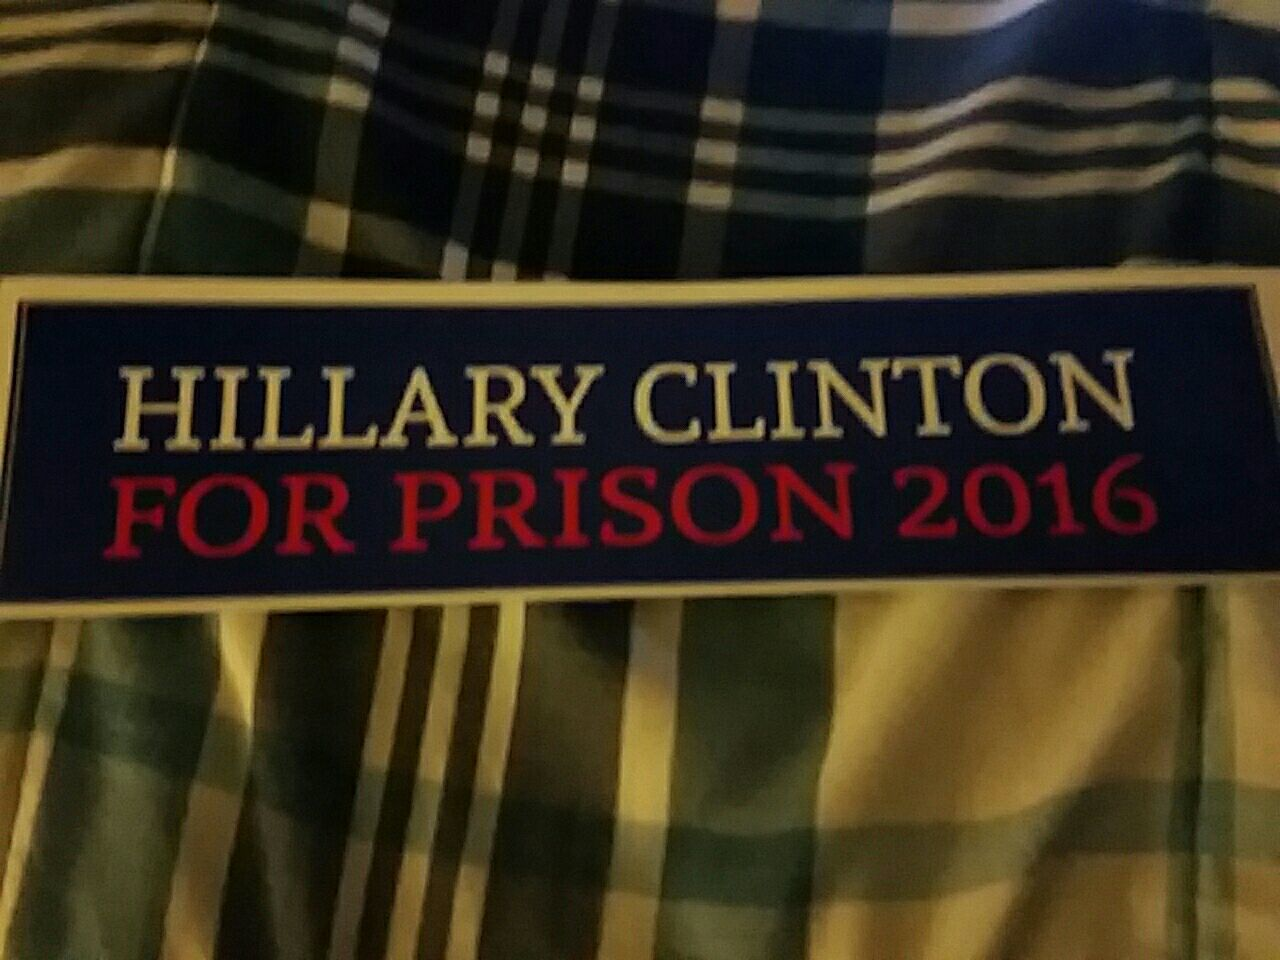 Cameron McCarty's photograph of their Hillary Clinton for Prison Bumper Sticker